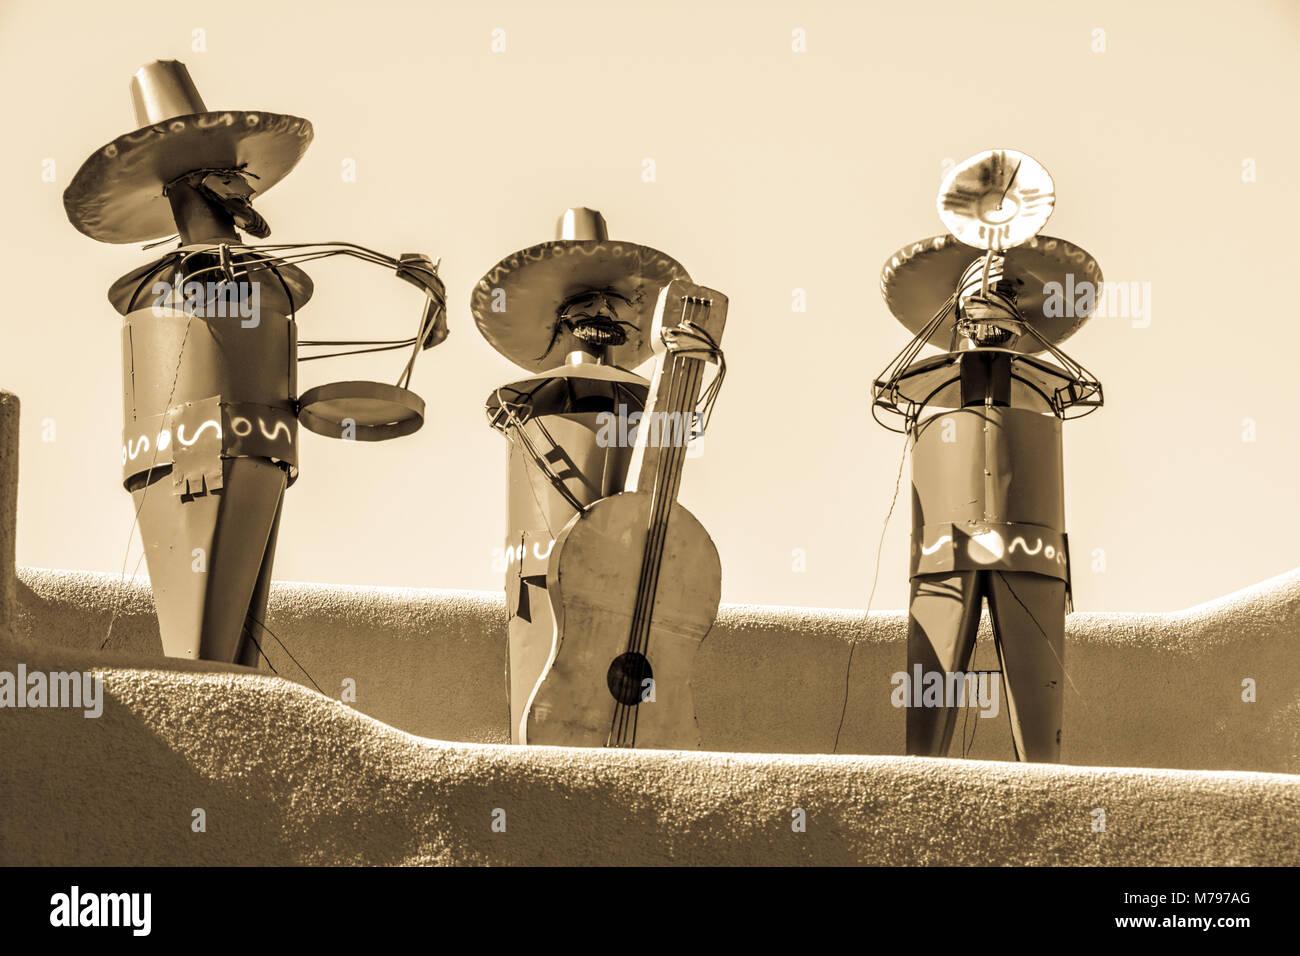 new Mexico - Stock Image